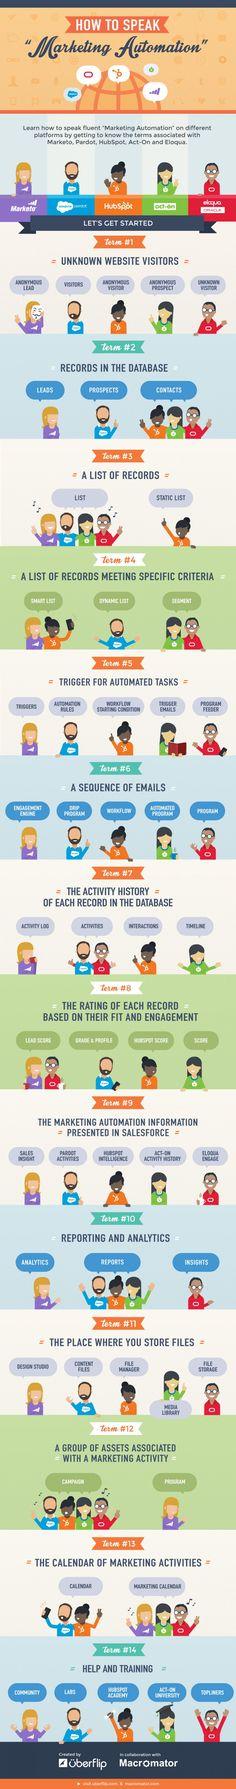 "How to Speak ""Marketing Automation"" #Infographic #infografía"